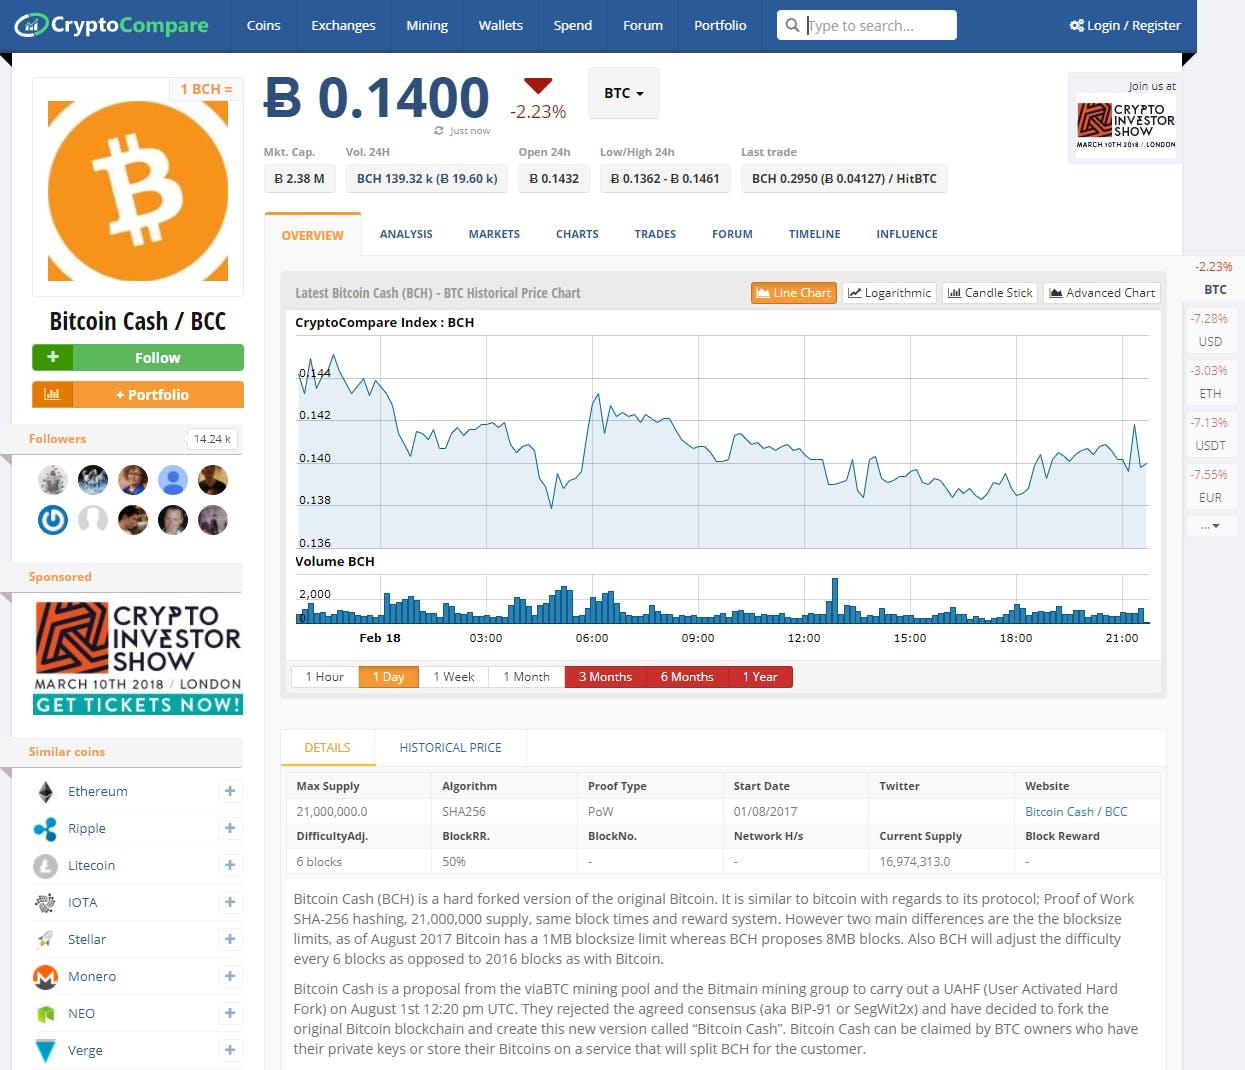 cryptocompare.com